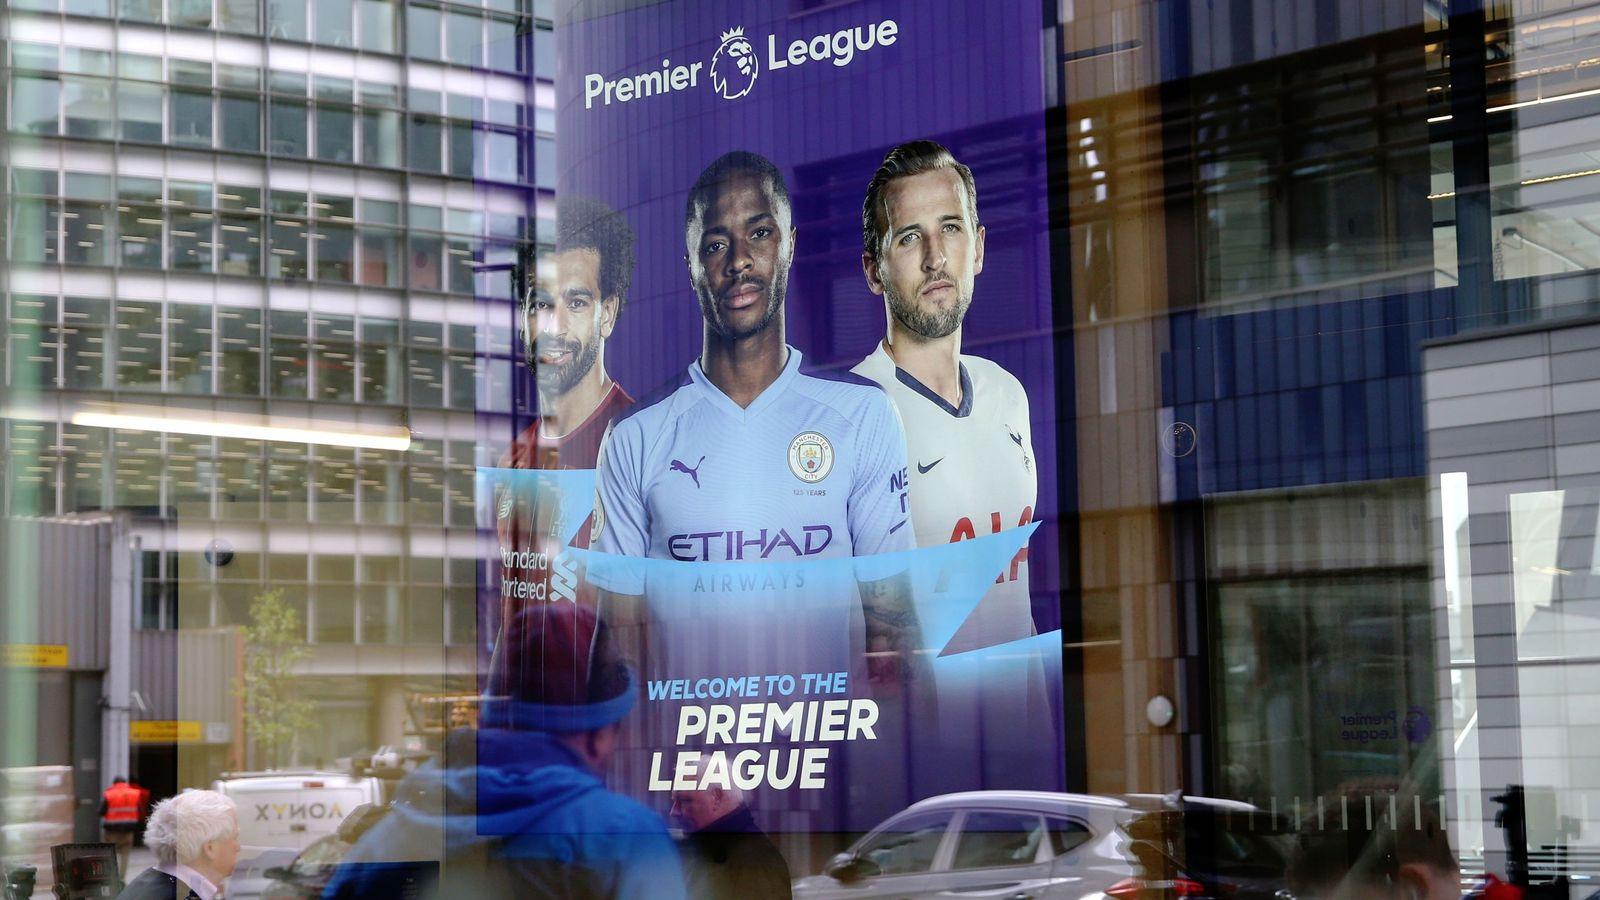 Coronavirus: la Premier League debería liderar la crisis de coronavirus, dice Gary Neville   Noticias de futbol 16